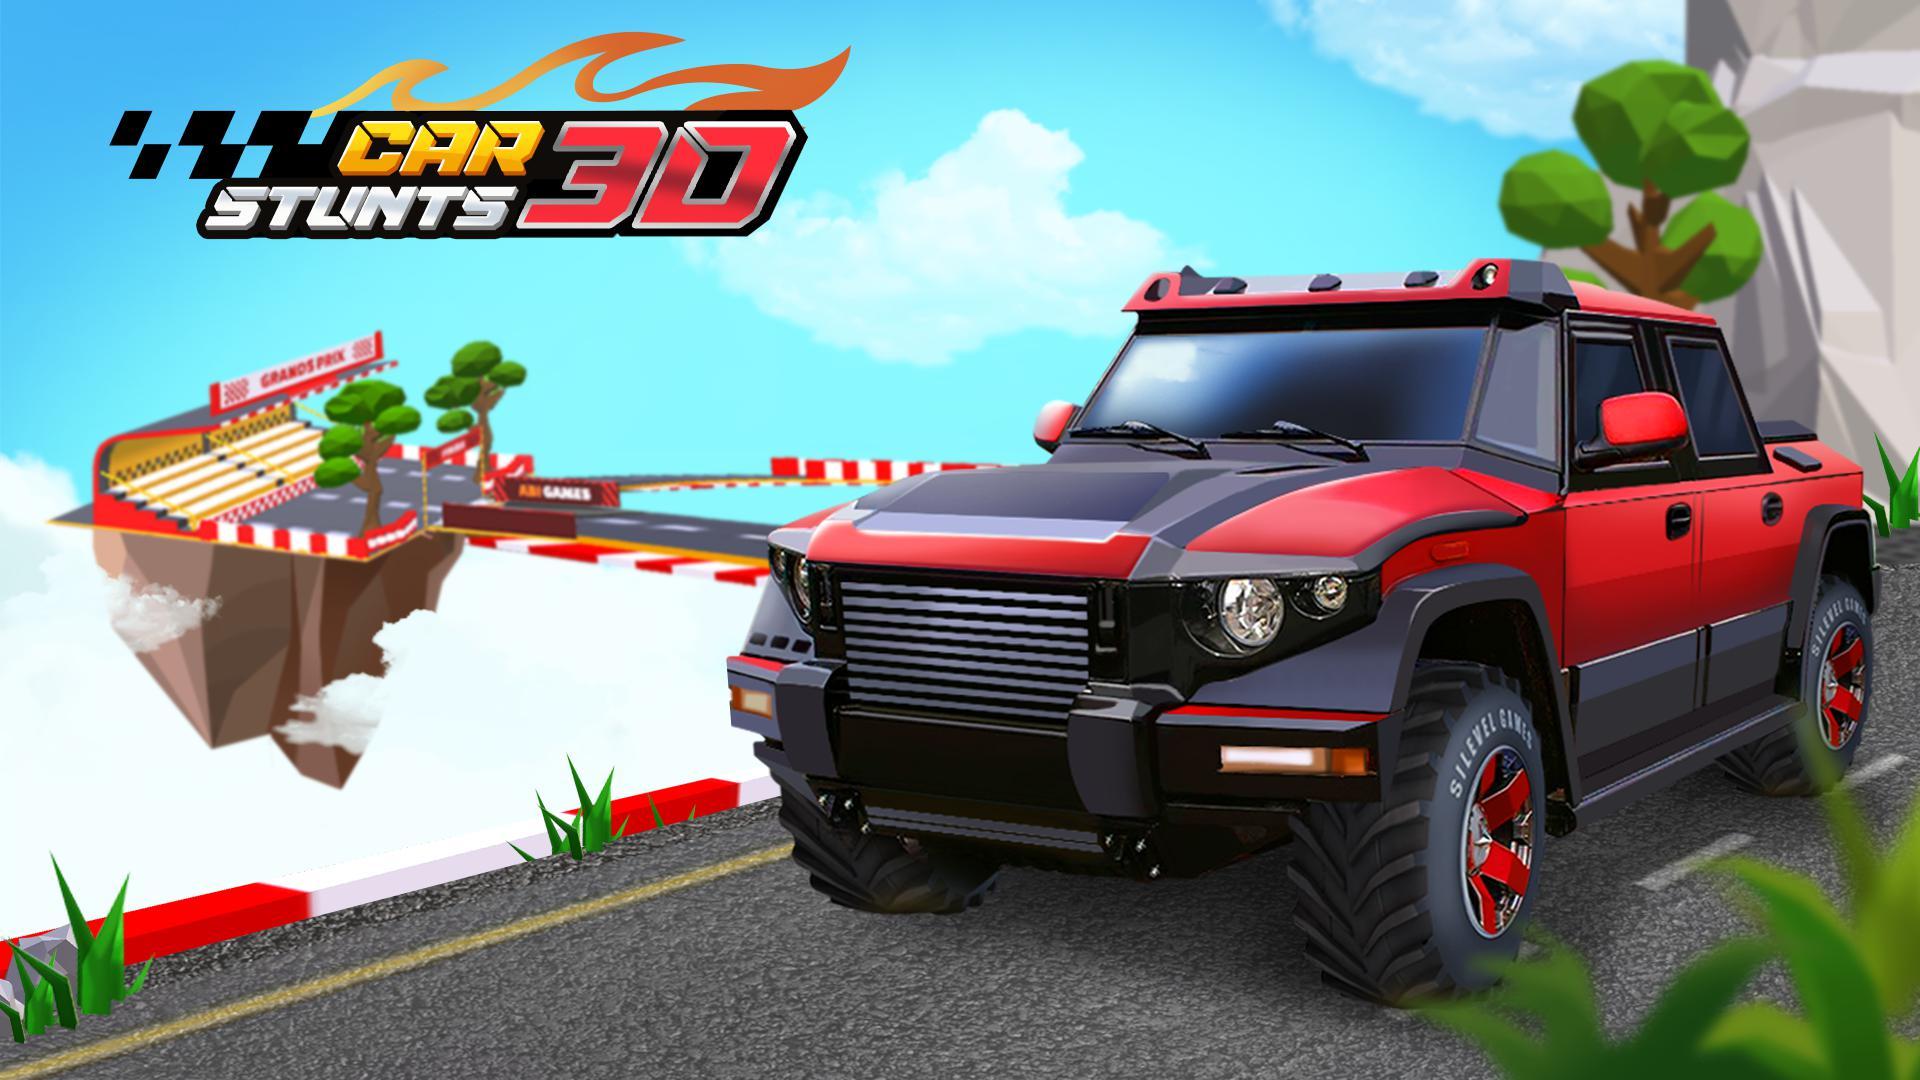 Car Stunts 3D Free - Extreme City GT Racing 游戏截图1